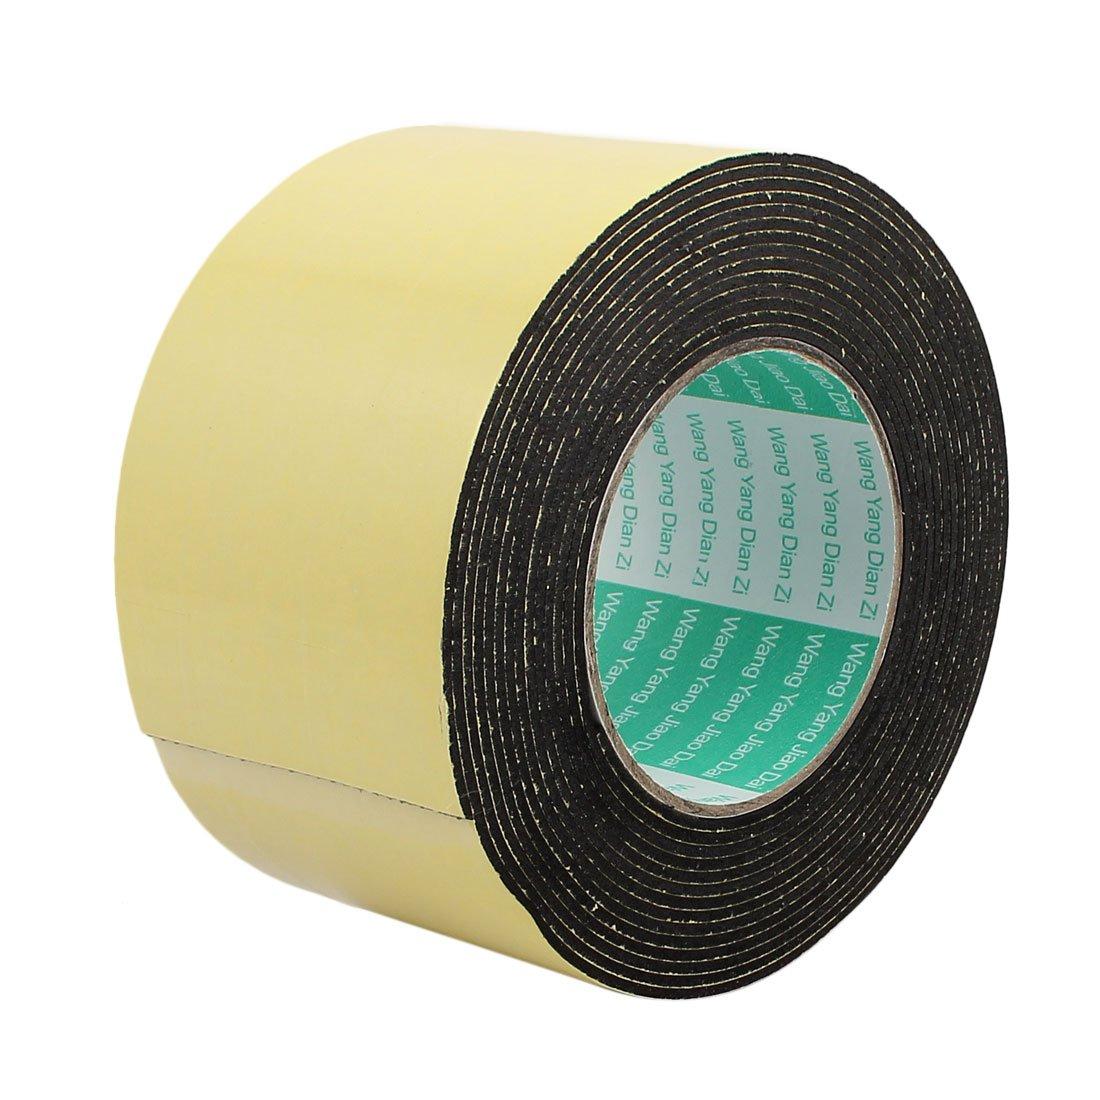 sourcing map 5Metro 80mm X 2mm Cinta Adhesiva de Marcaje Una Sola Cara de Espuma Esponja Protecció n de Golpes Choques Amarillo Negro SYNCTEA013642